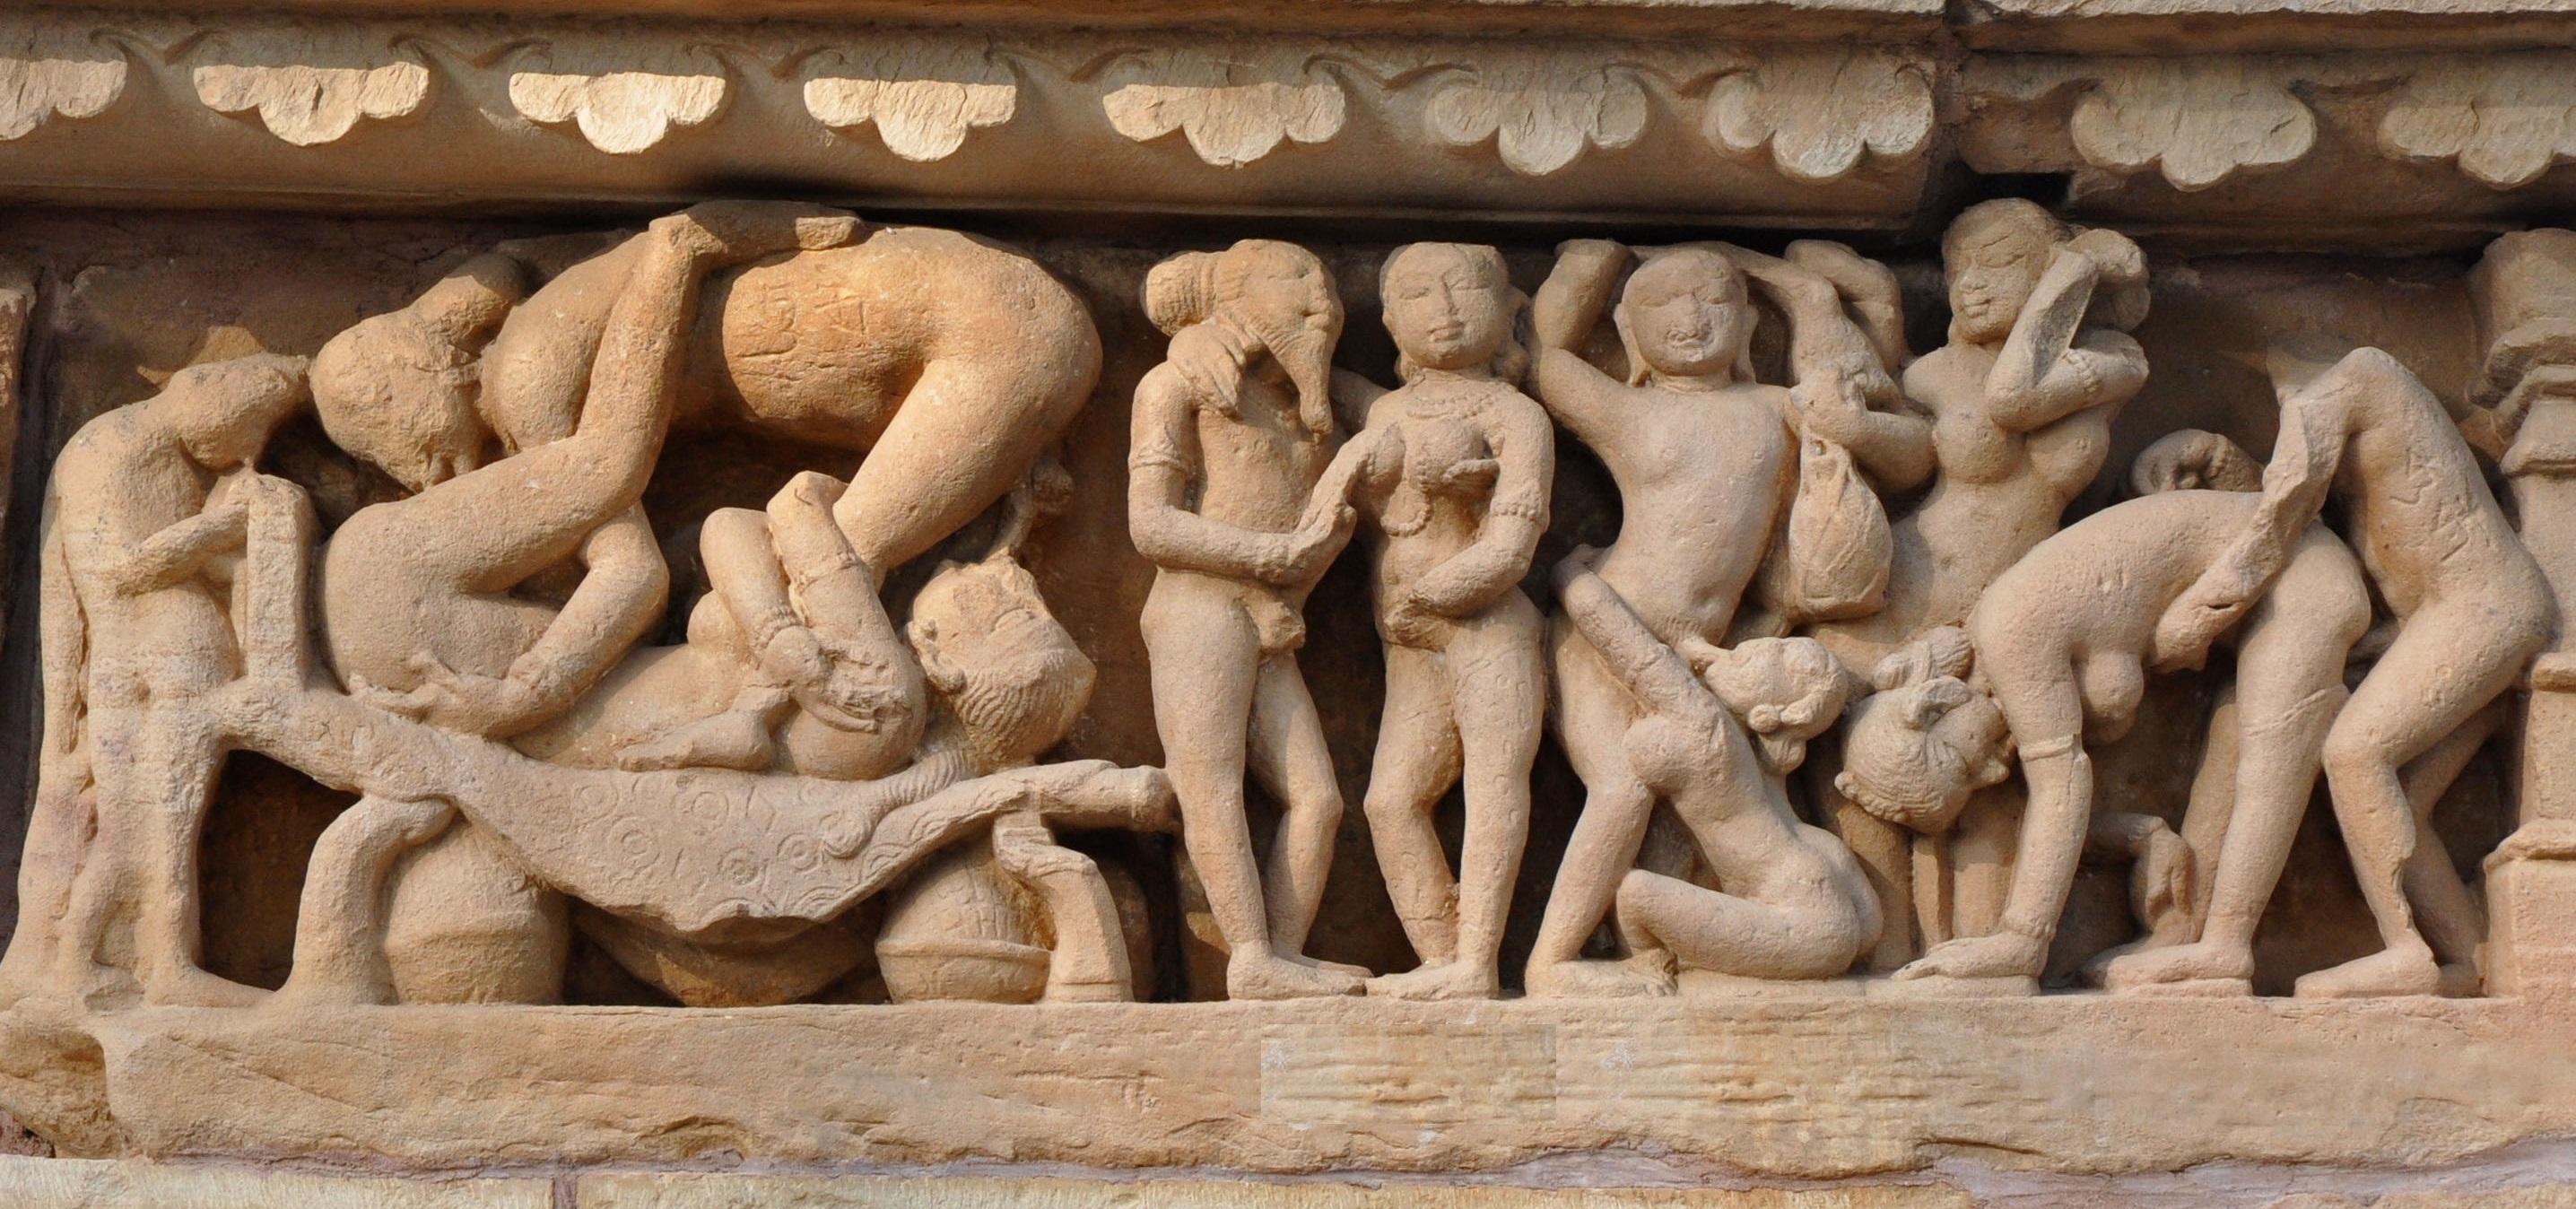 Figuras en Khajuraho